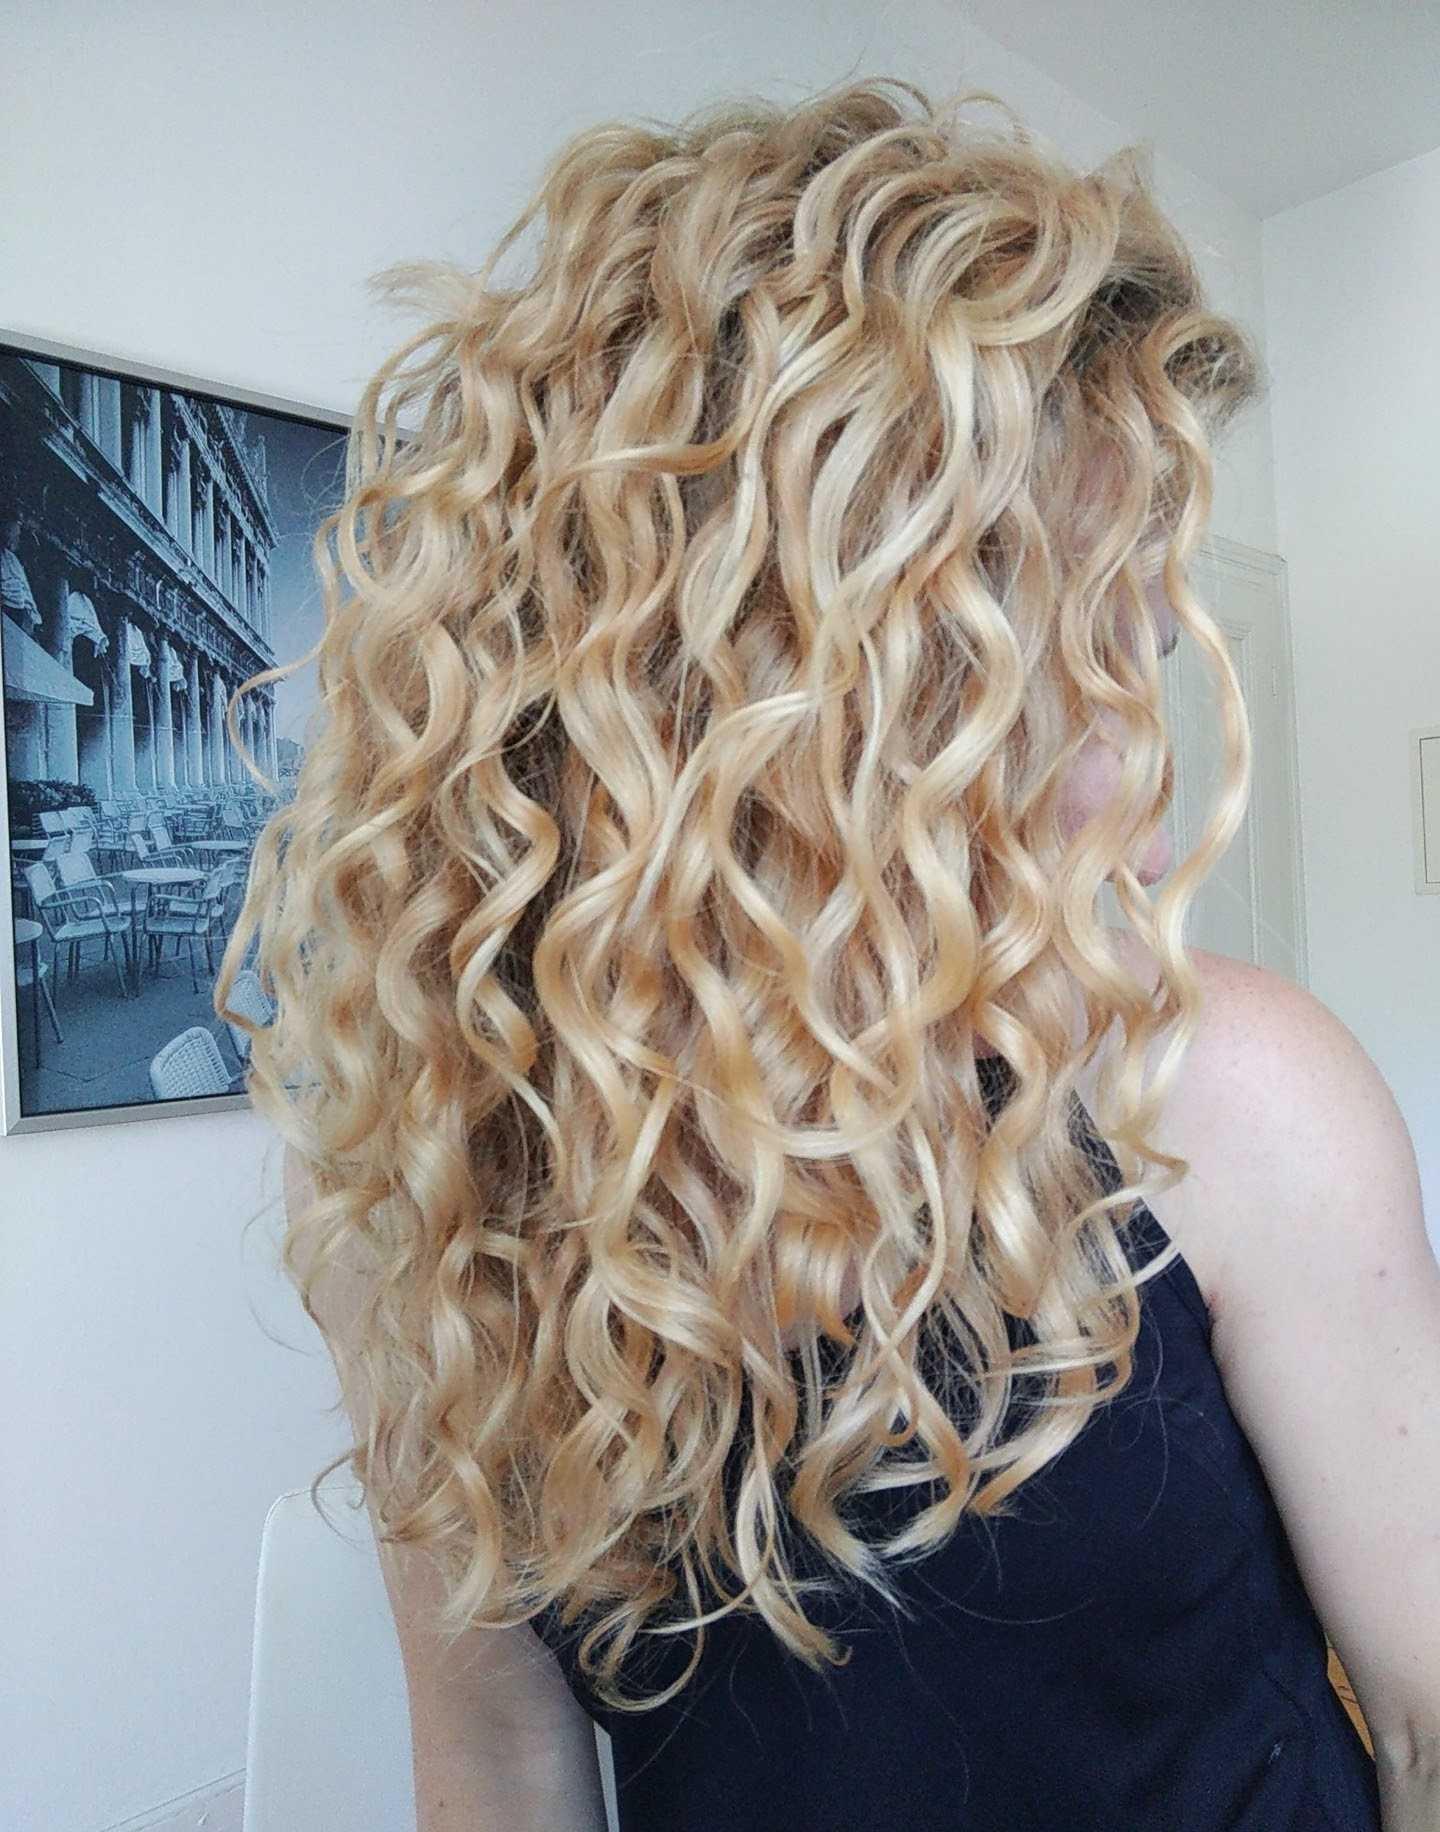 Hair photo side 1.jpg